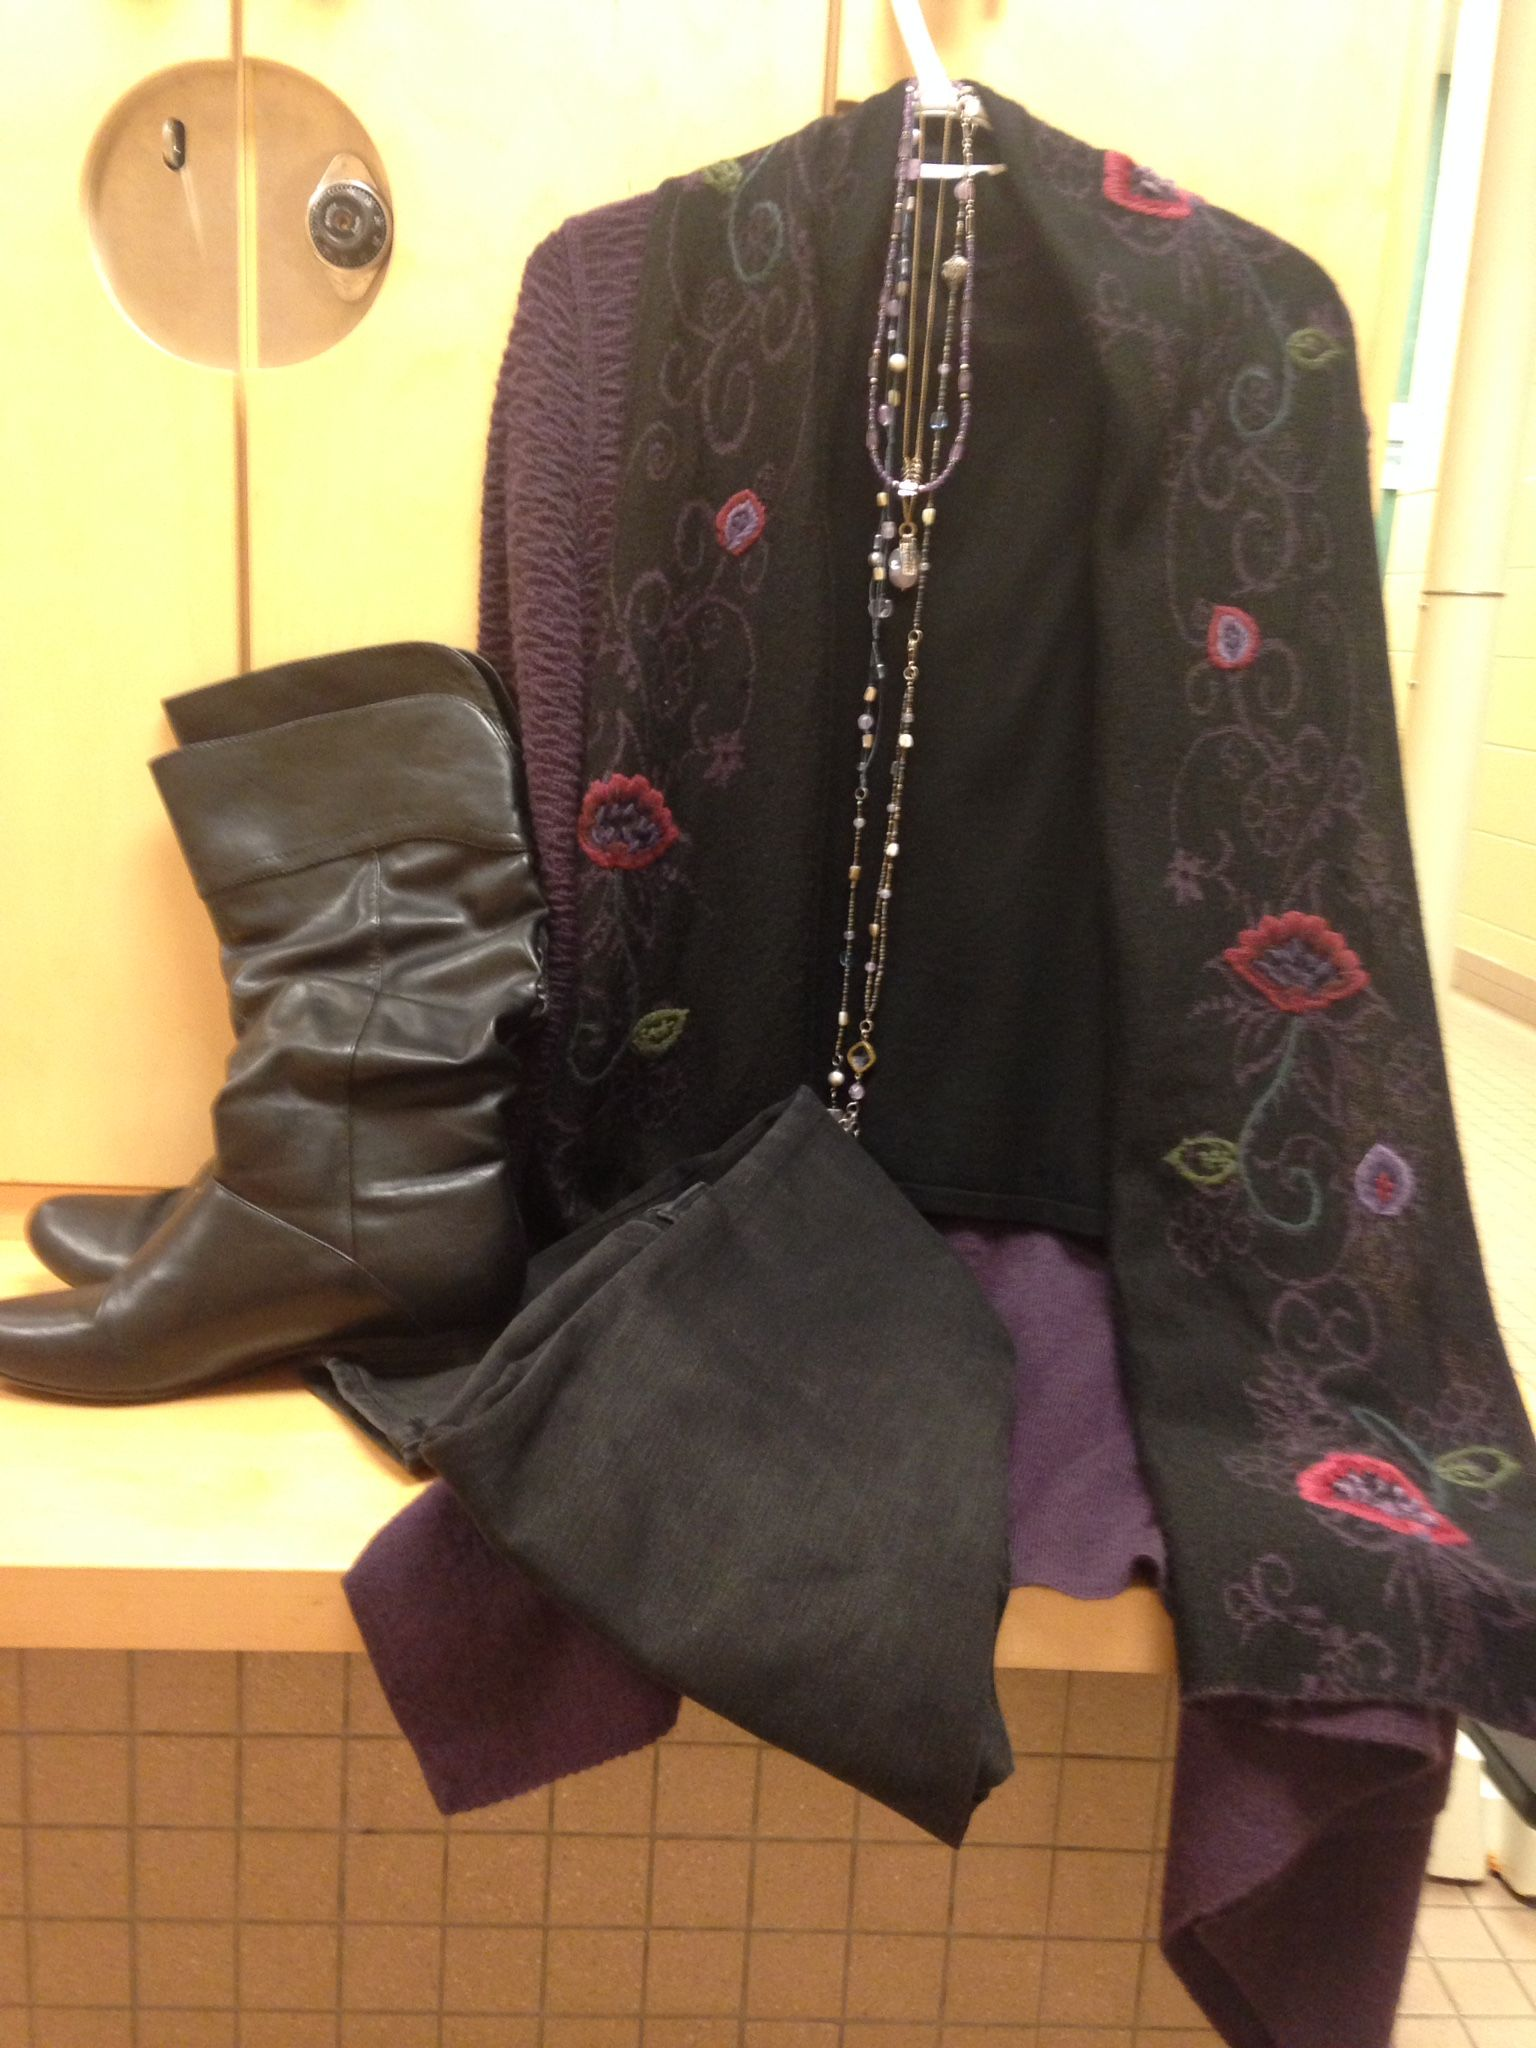 2016-01-08. Black mock turtleneck short sleeved sweater. Black jeans.  Purple alpaca sweater jacket.   Black leather boots.